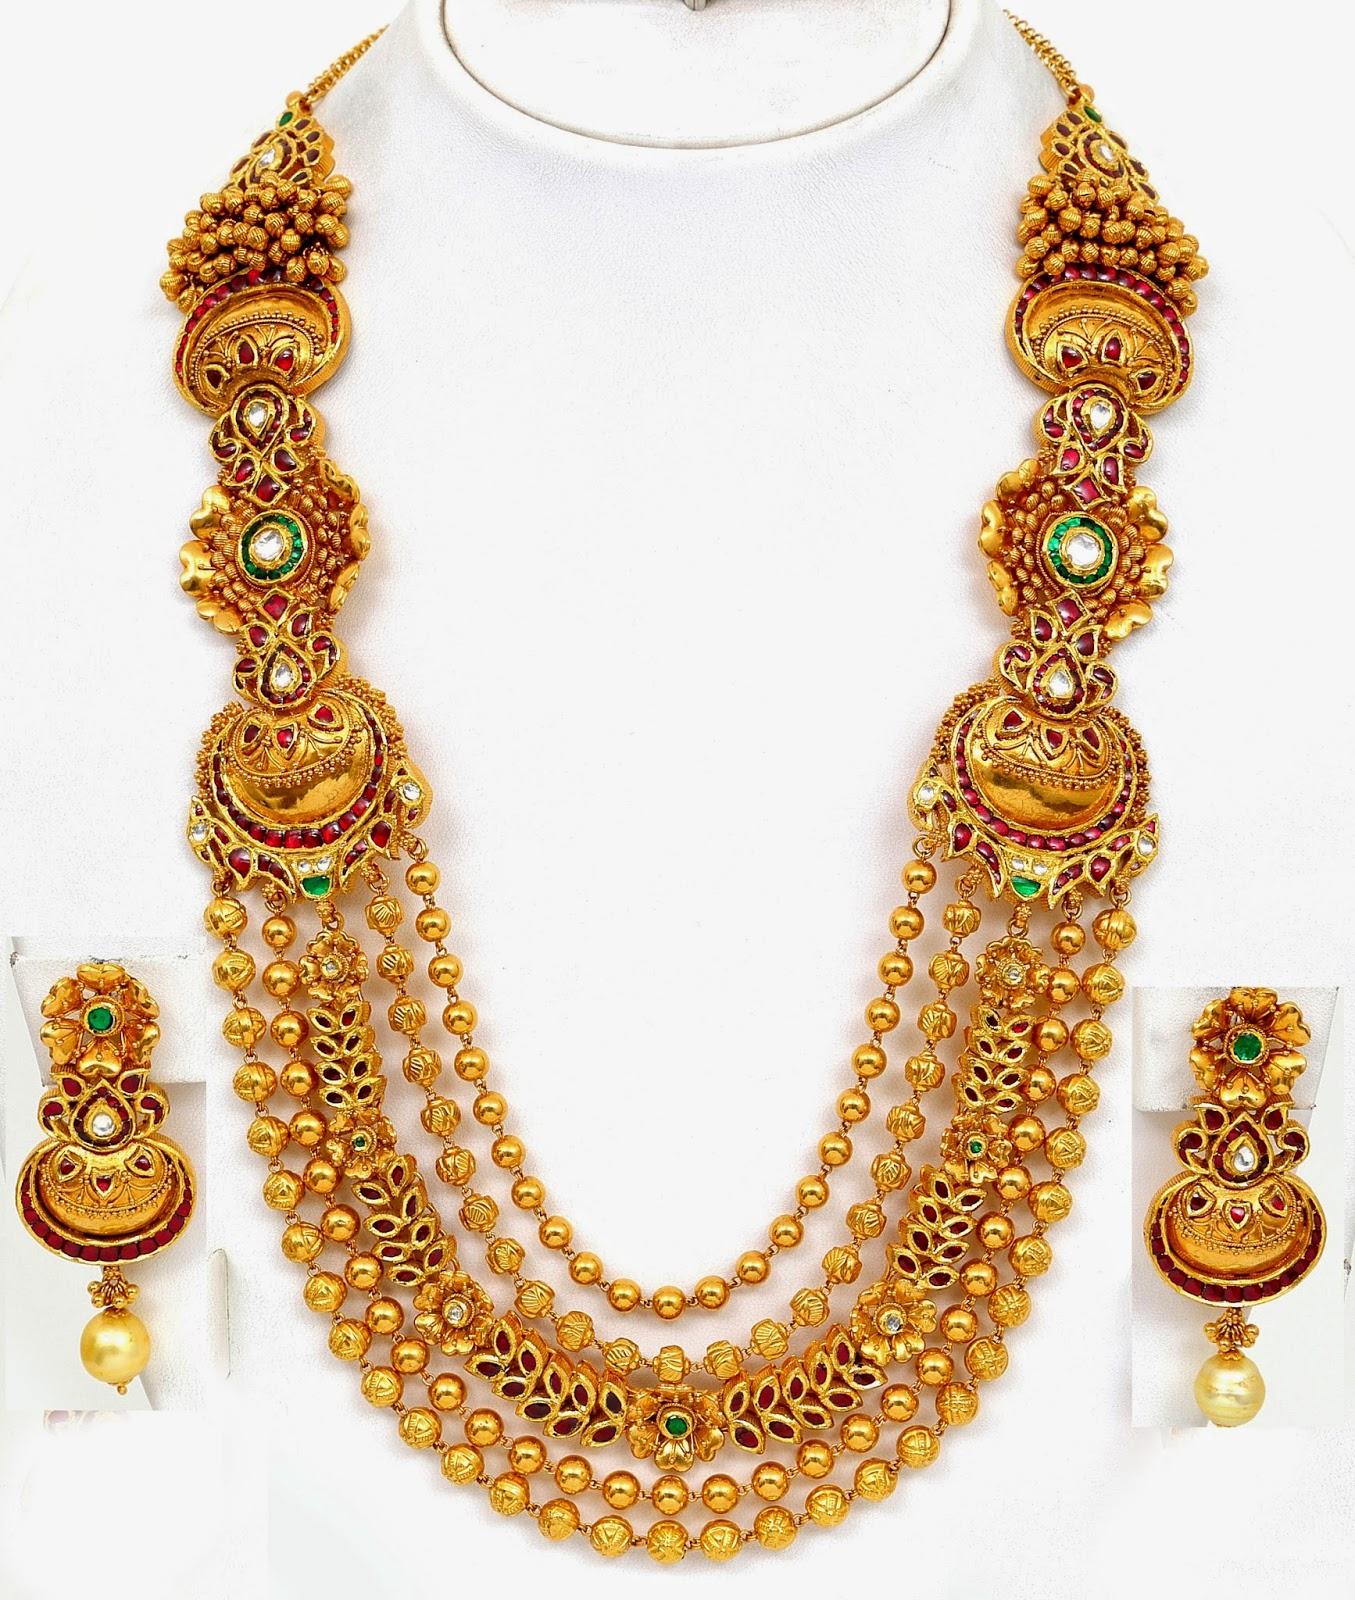 Beautiful Latest Gold Chain Designs In Dubai | Jewellry\'s Website